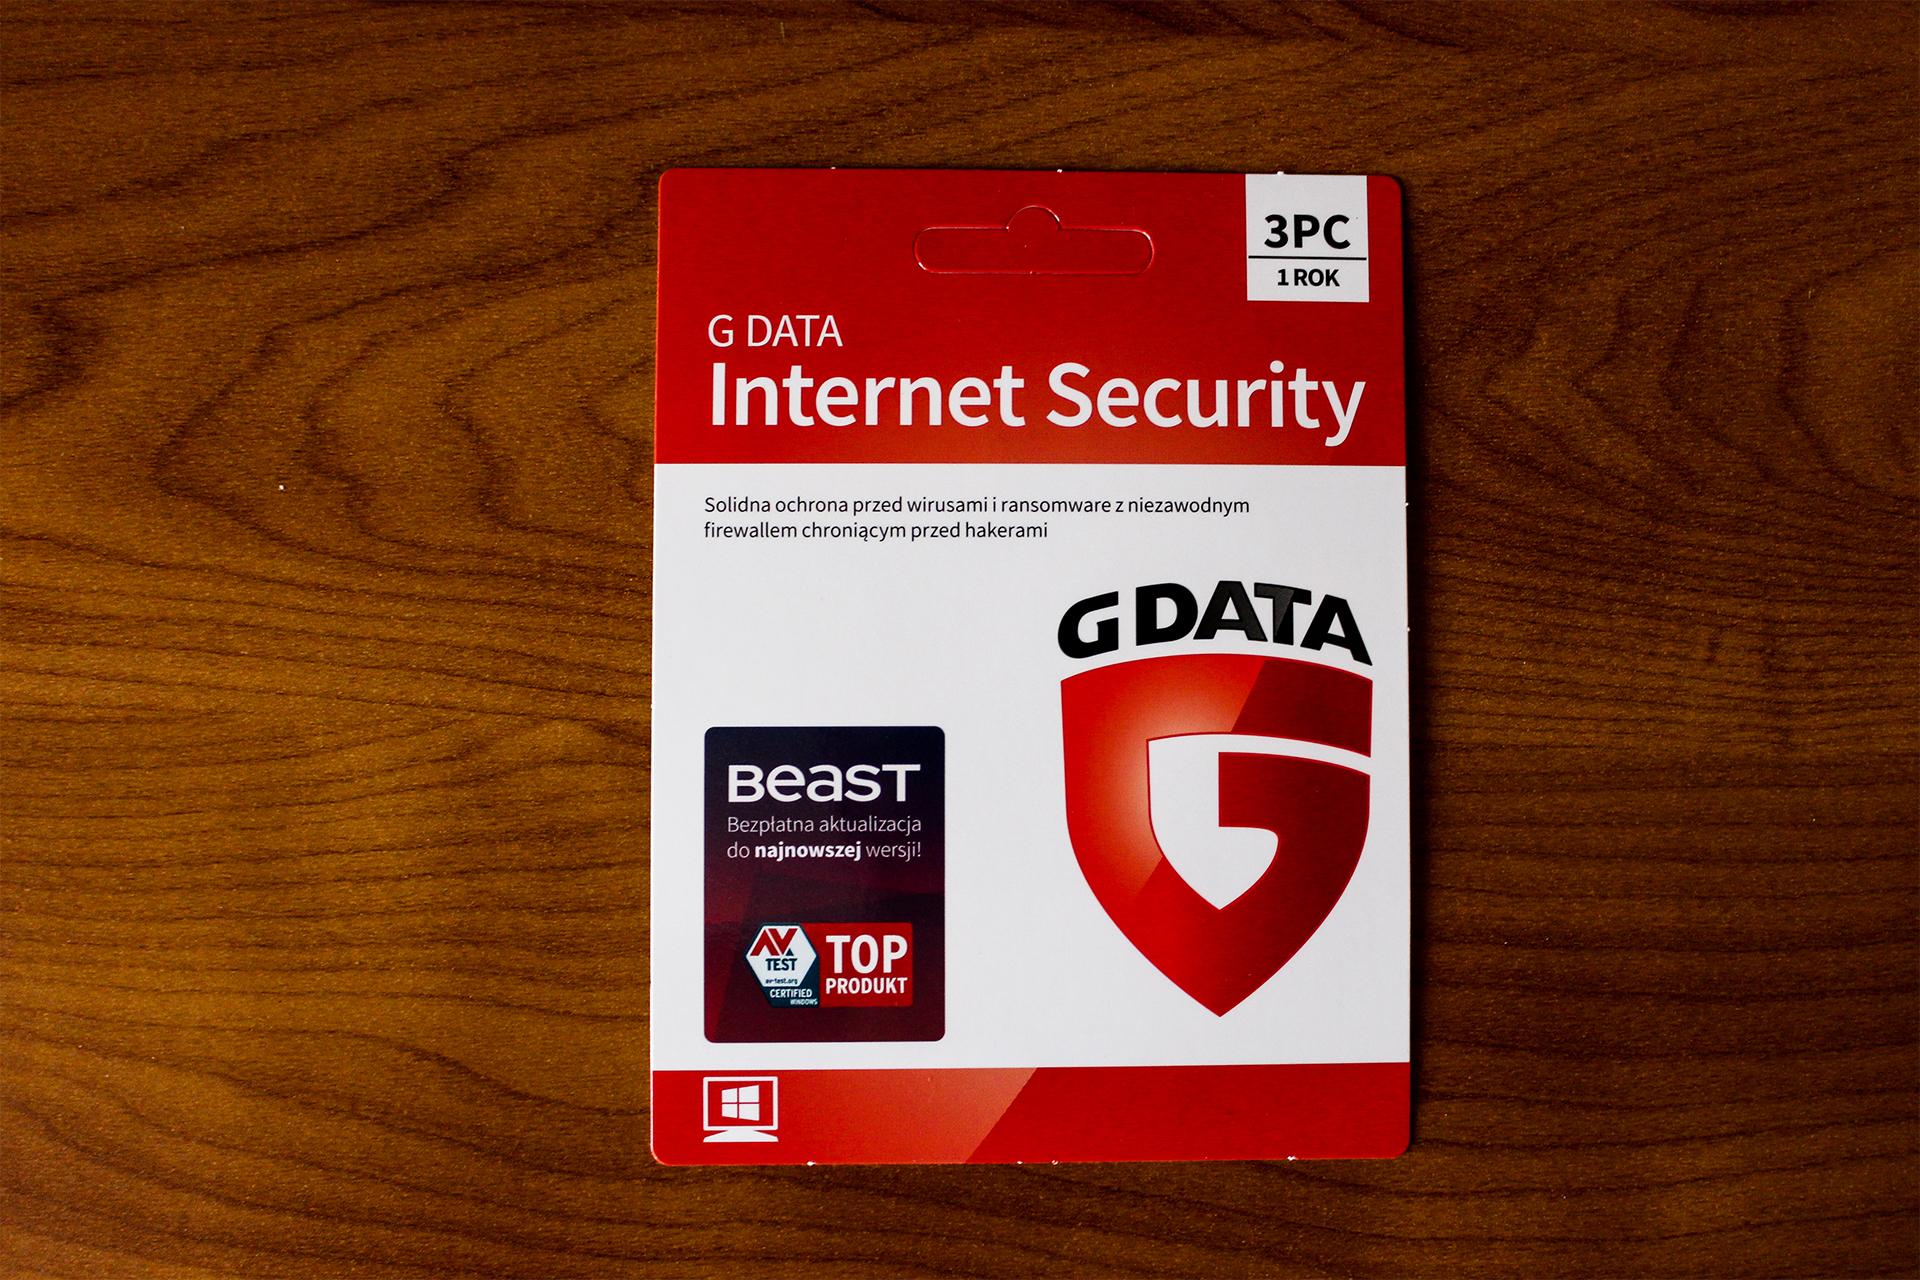 G DATA INTERNET SECURITY 3PC 1 ROK KARTA KLUCZ